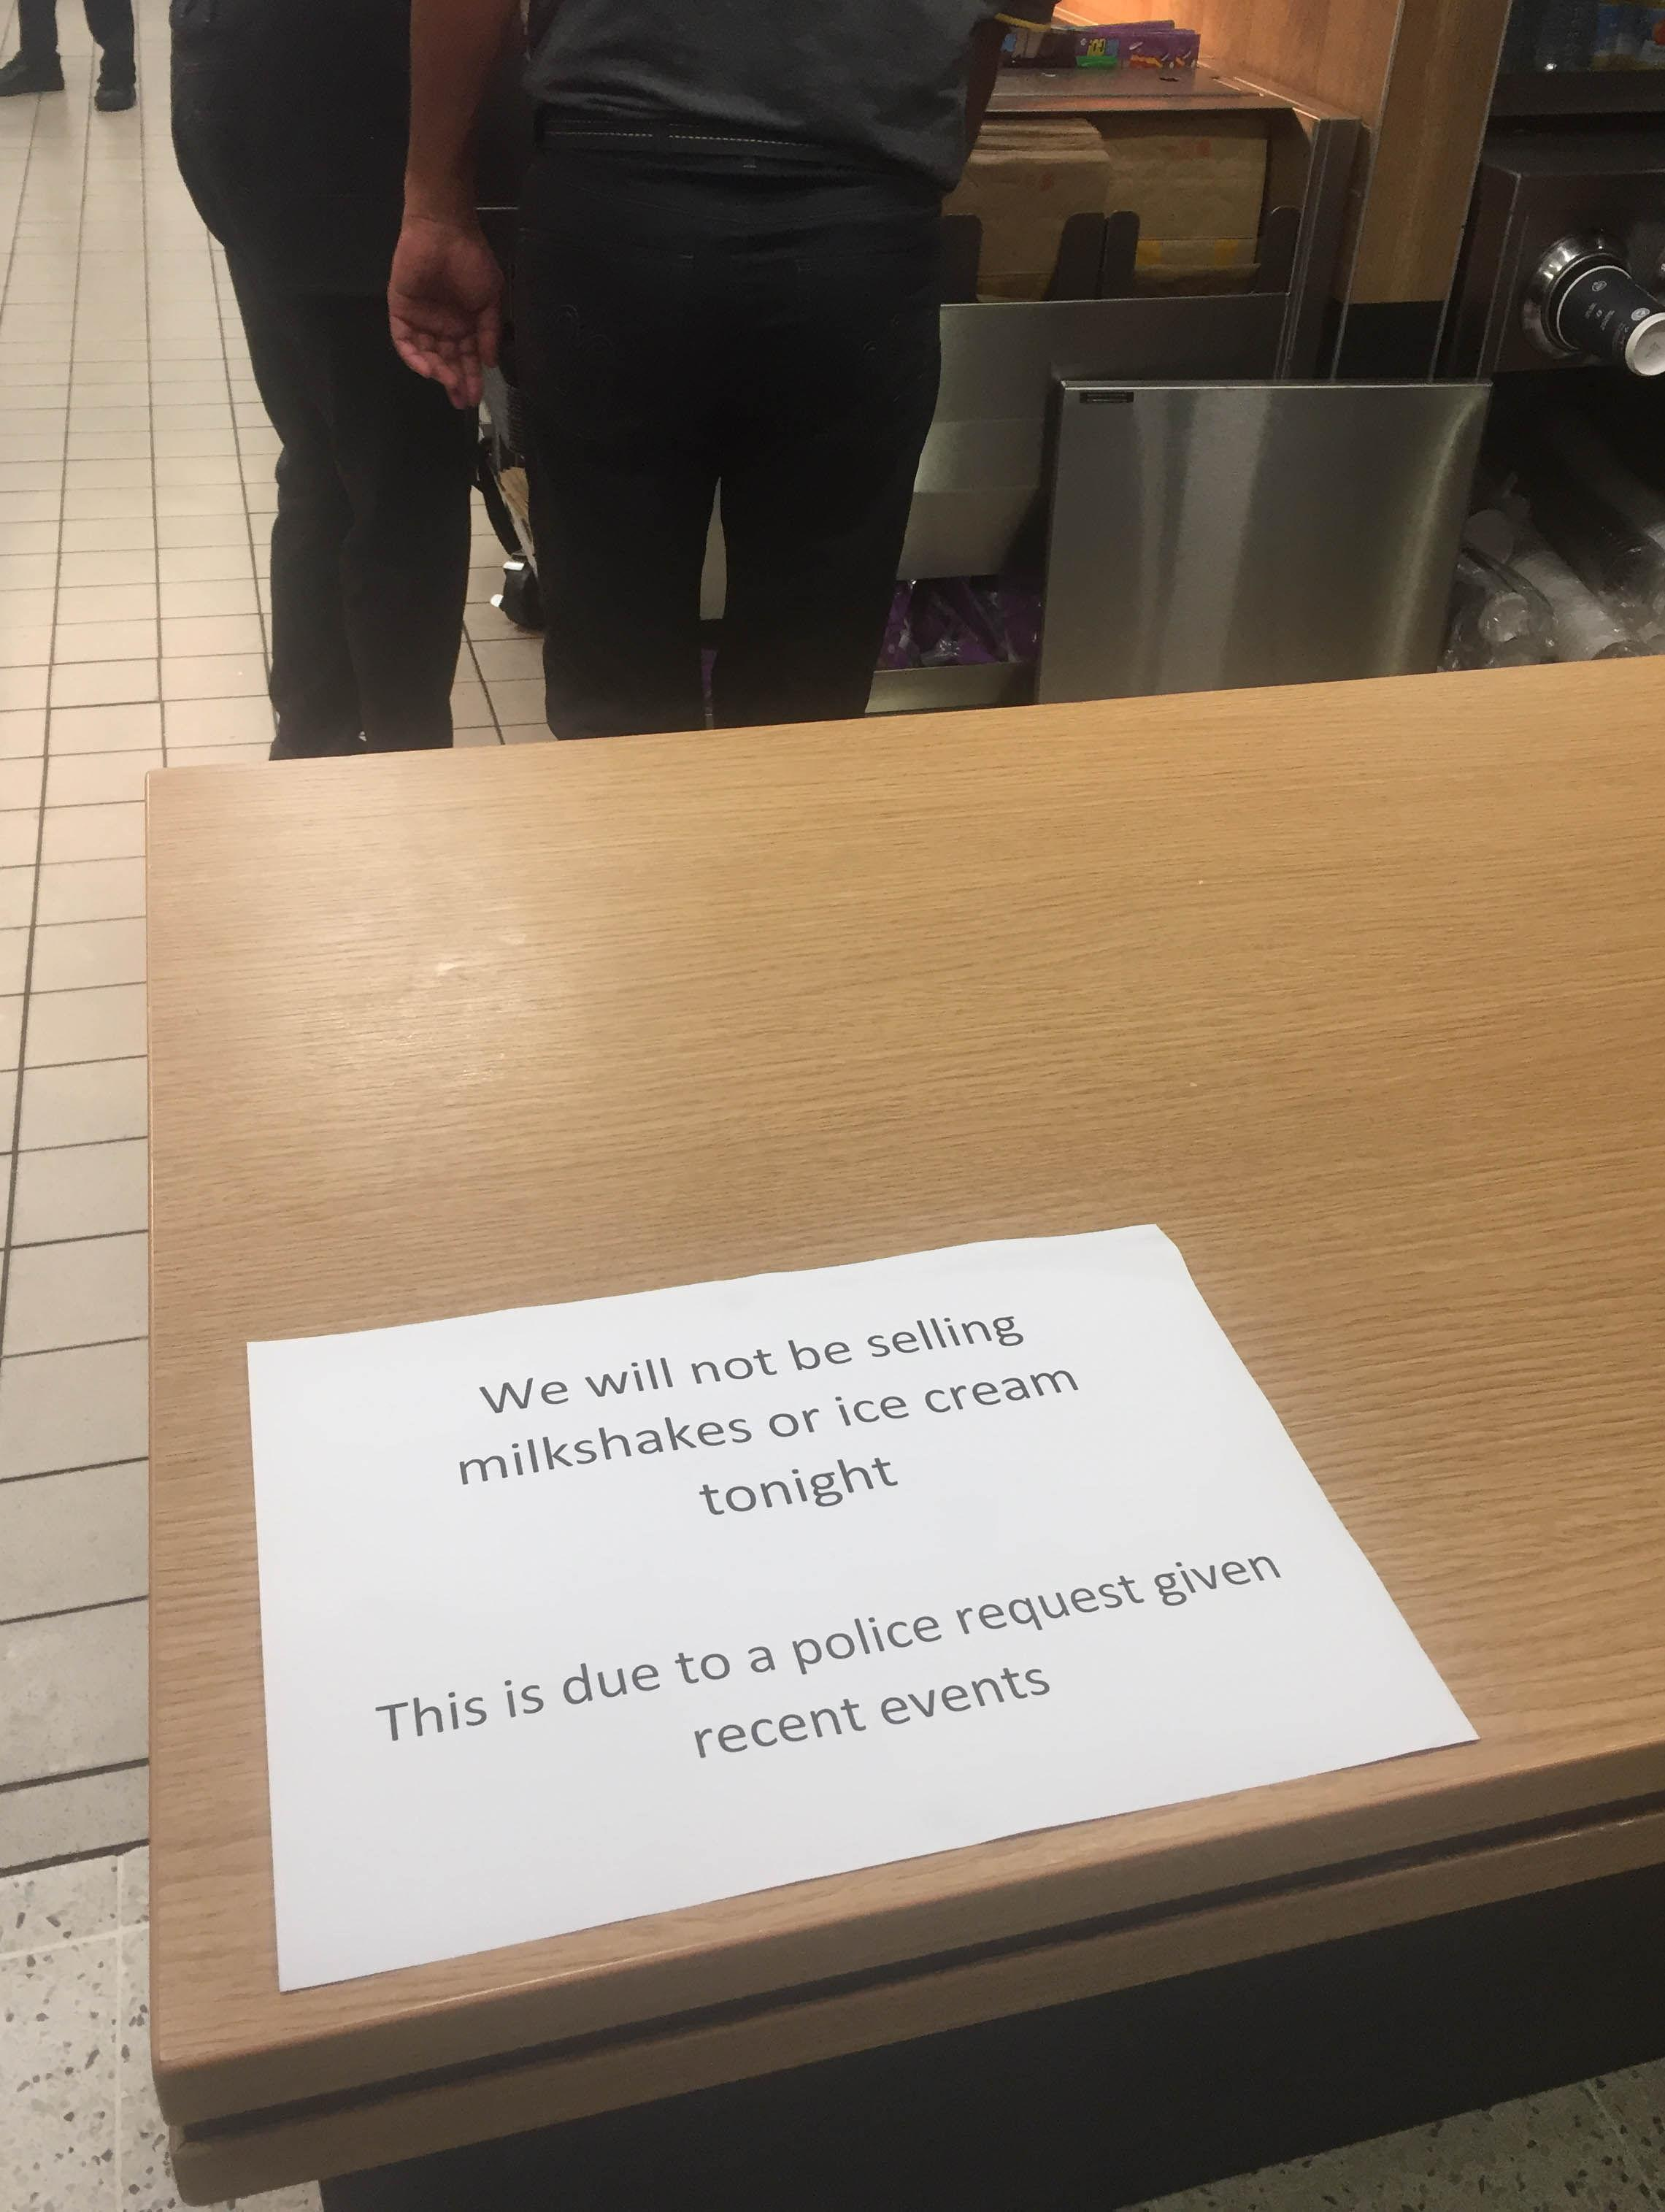 Police order McDonald's not to sell milkshakes near Nigel Farage rally